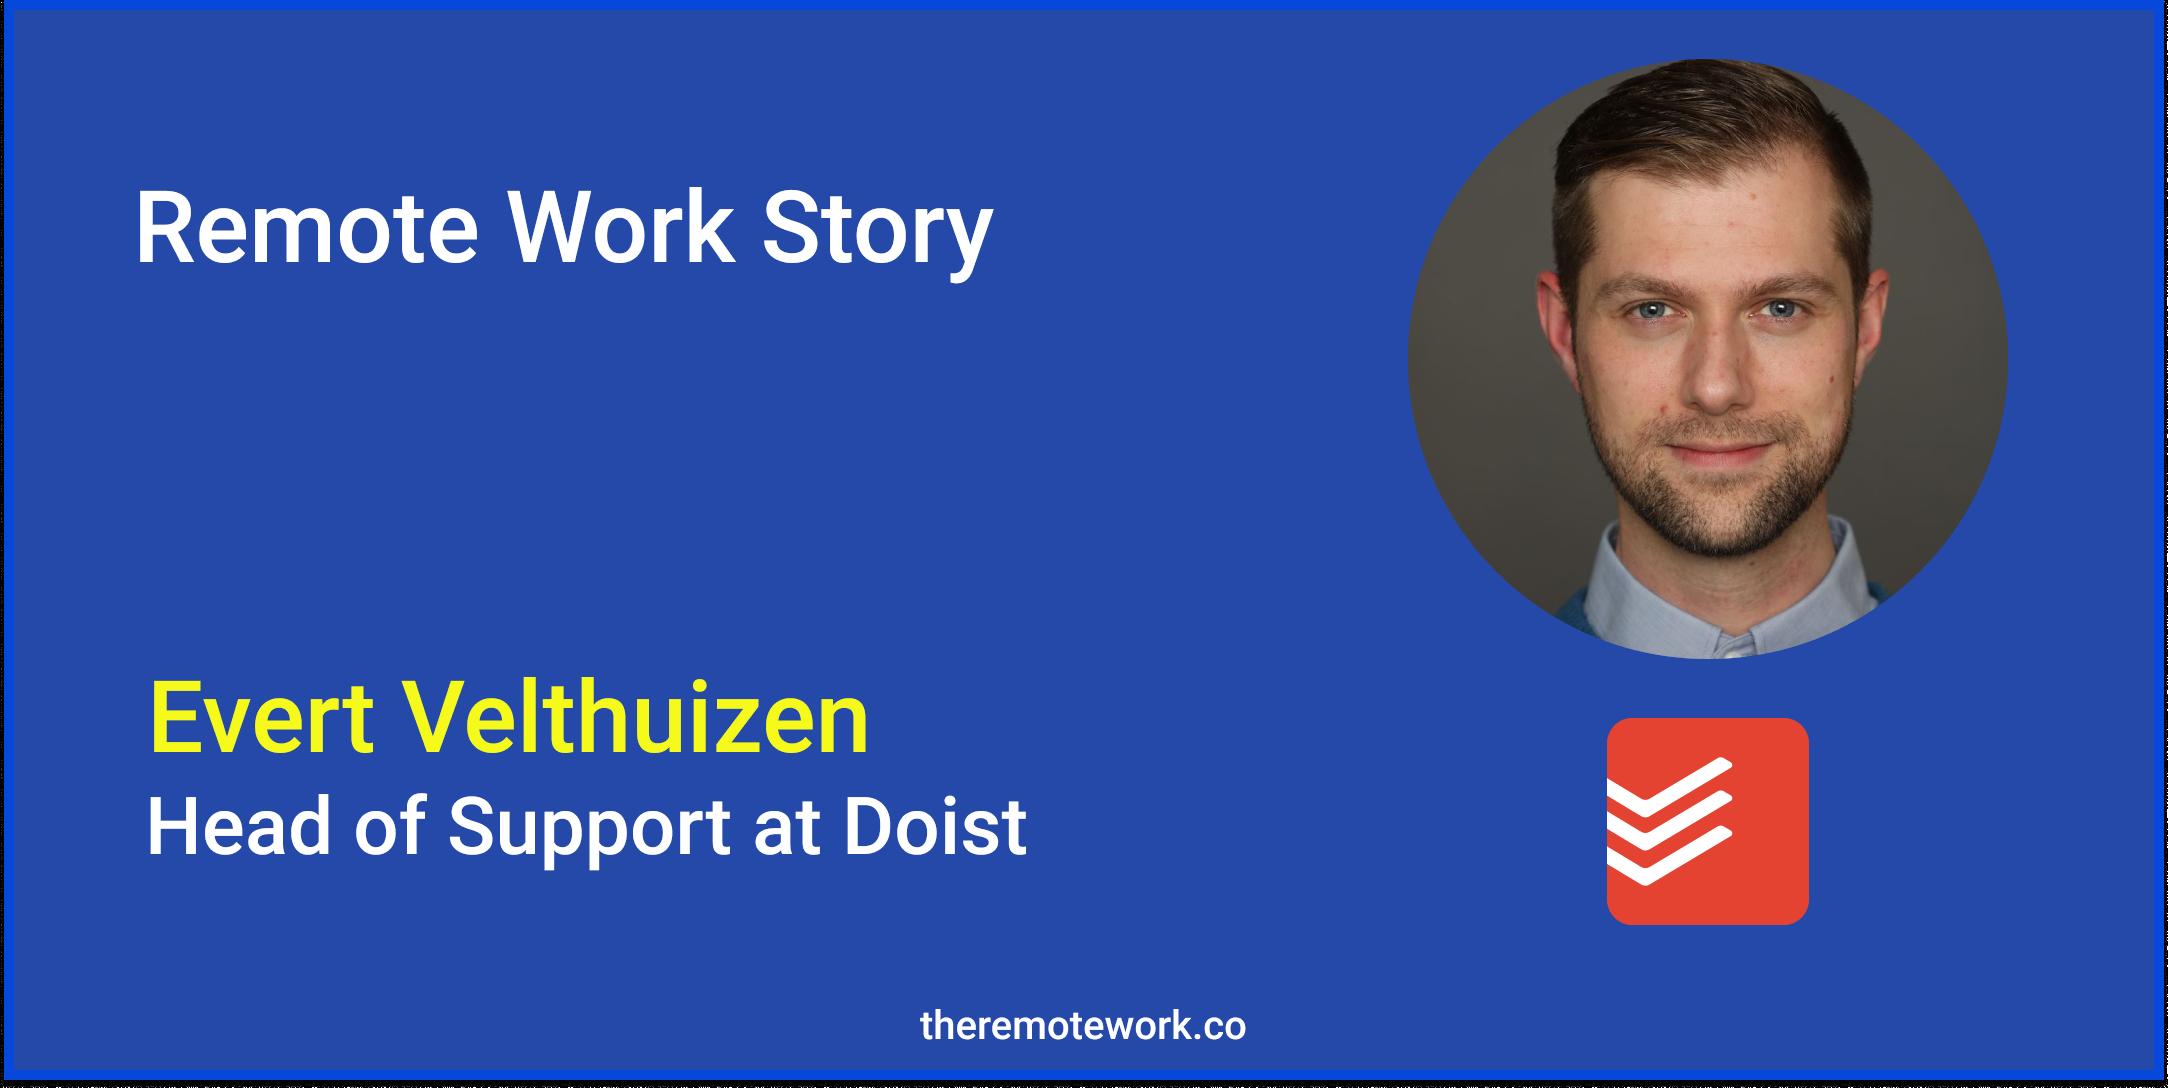 Remote Work Story of Evert Velthuizen